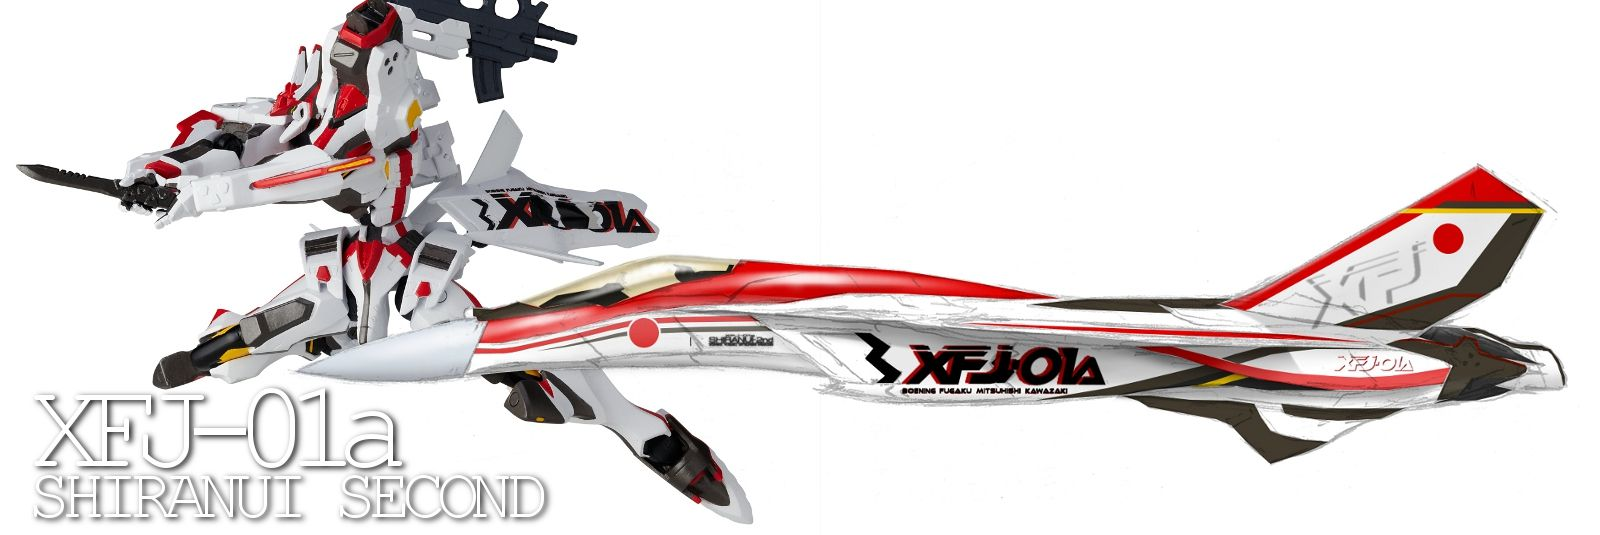 XFJ-01a 不知火・弐型 デモンストレーターカラー